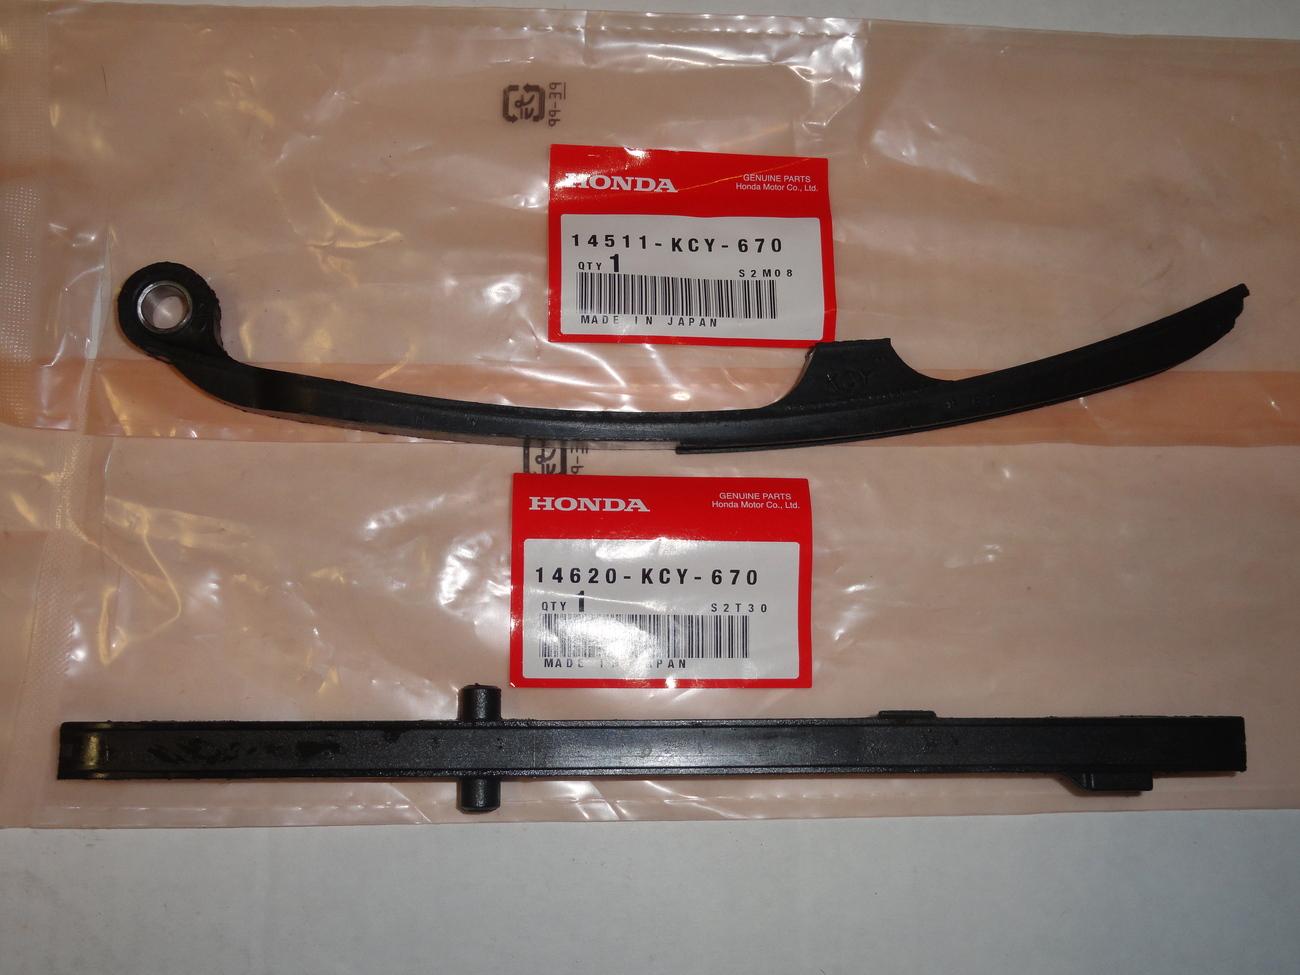 Wiseco Cam Camshaft Timing Chain Honda XR400 TRX400EX TRX400X CC004